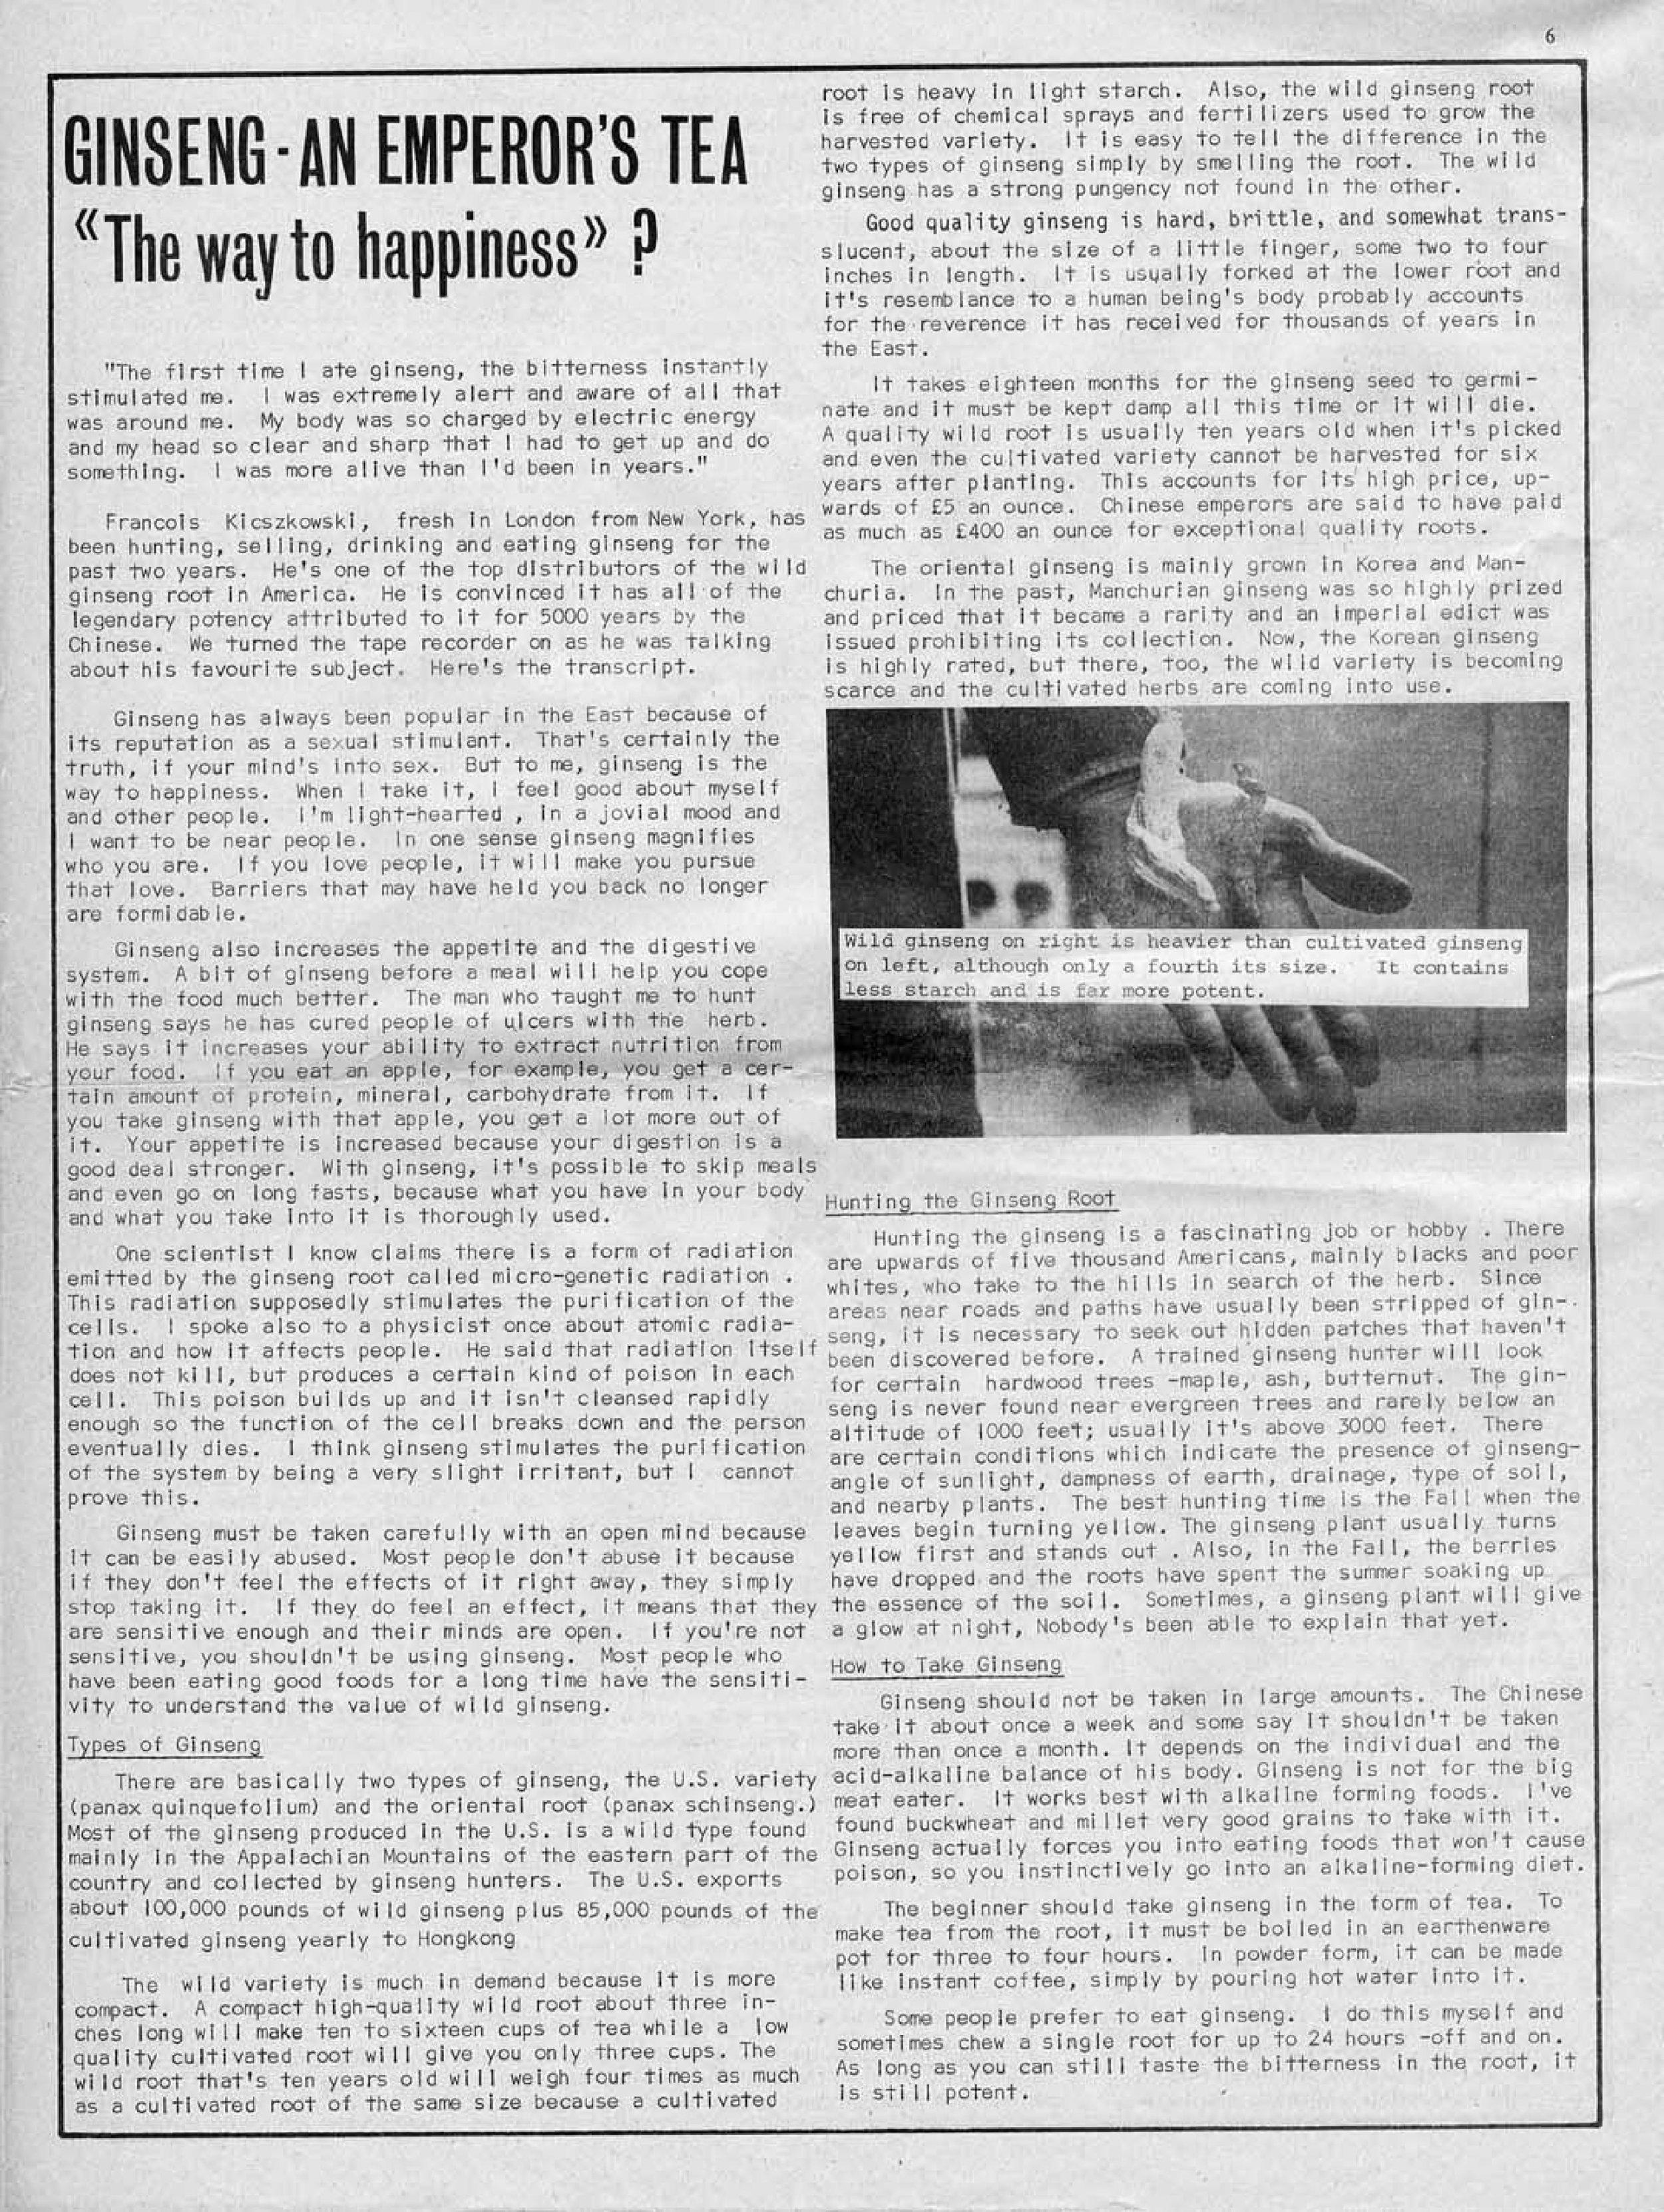 seed-v1-n3-april1972-06.jpg